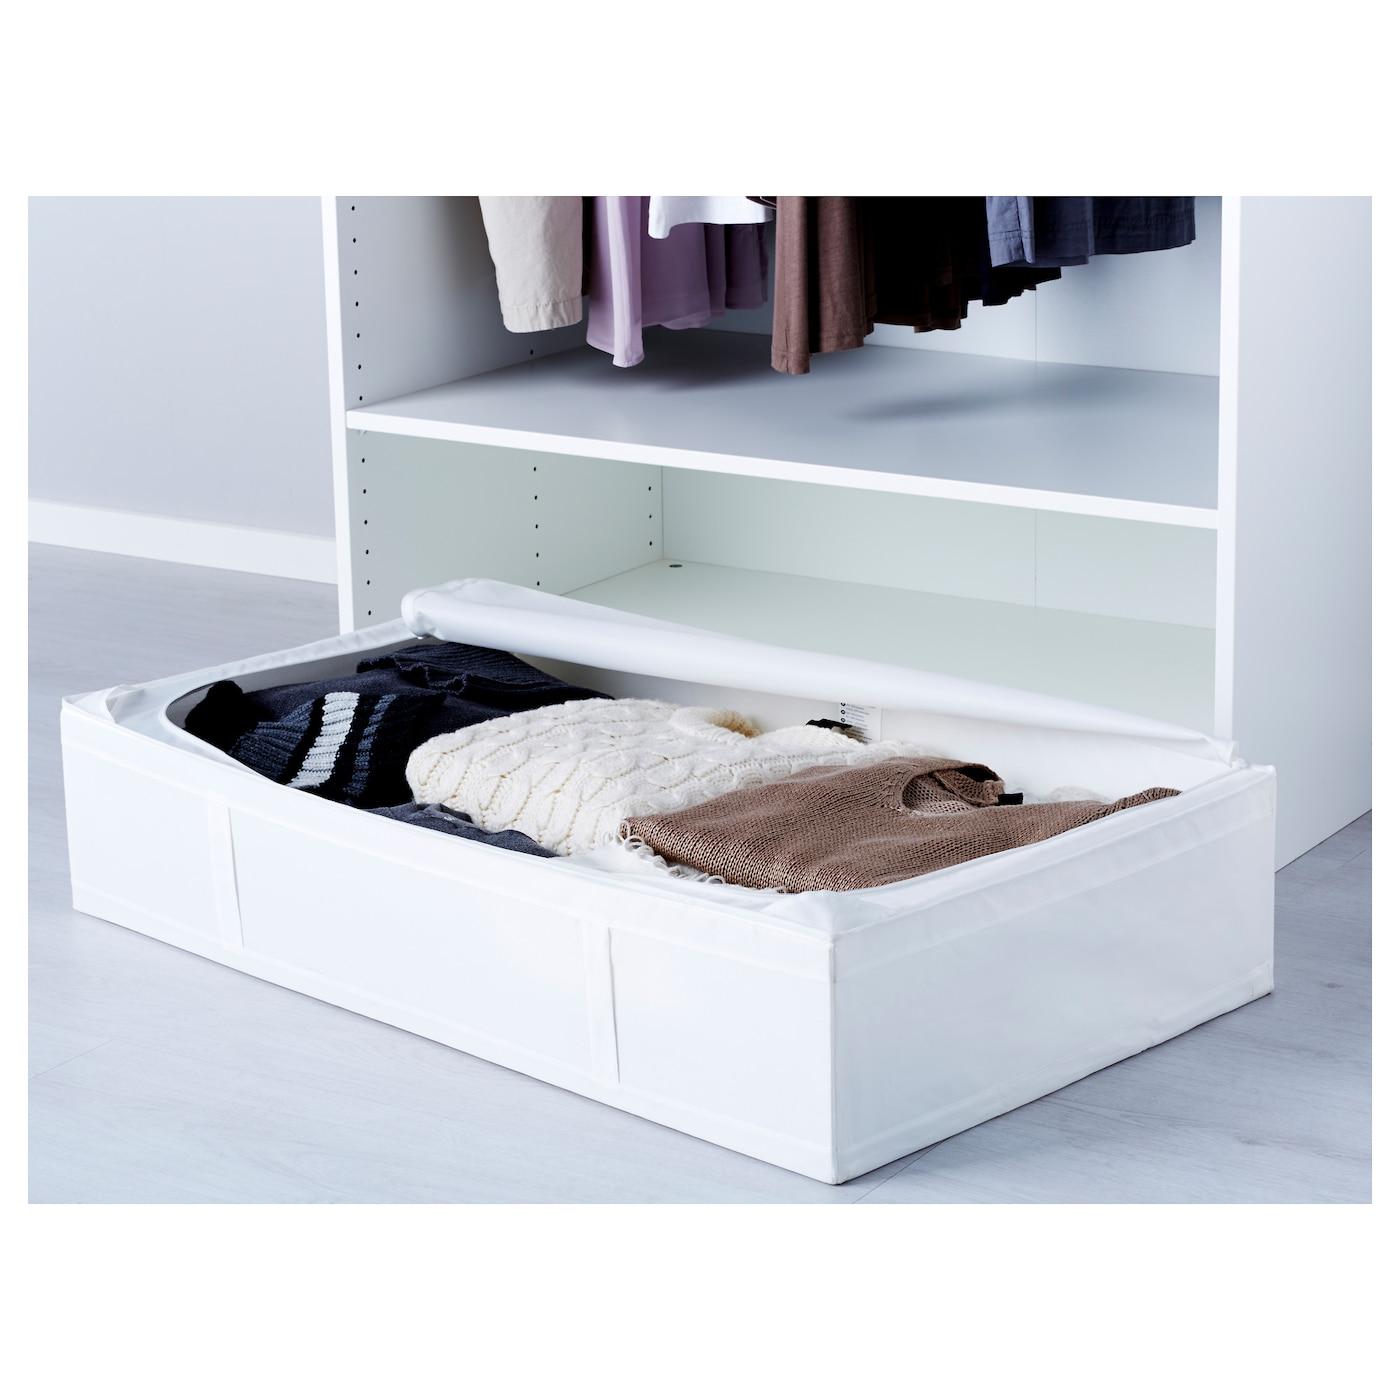 set of 3 black IKEA SKUBB Clothes cover